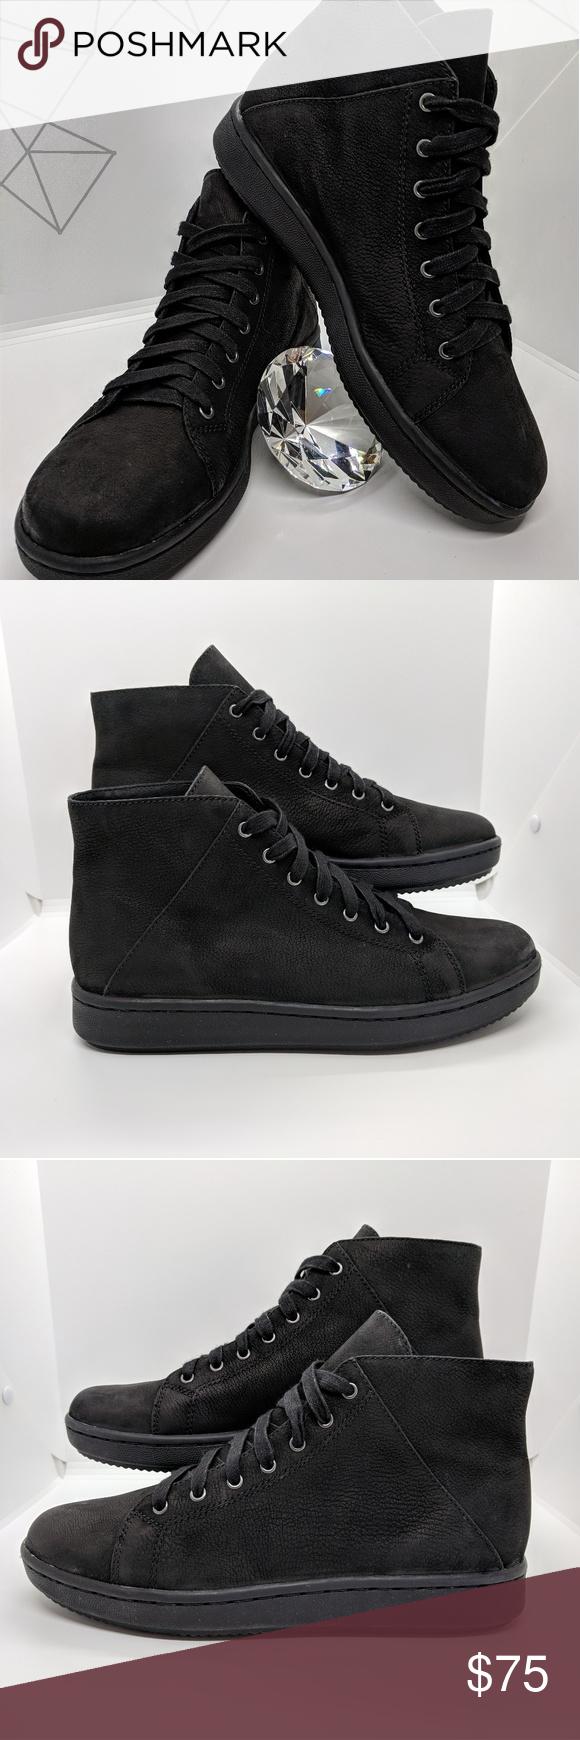 1a85253934 Eileen Fisher Game 2 Nubuck Black Sneaker Gorgeous black on black high top  sneaker. Tumbled